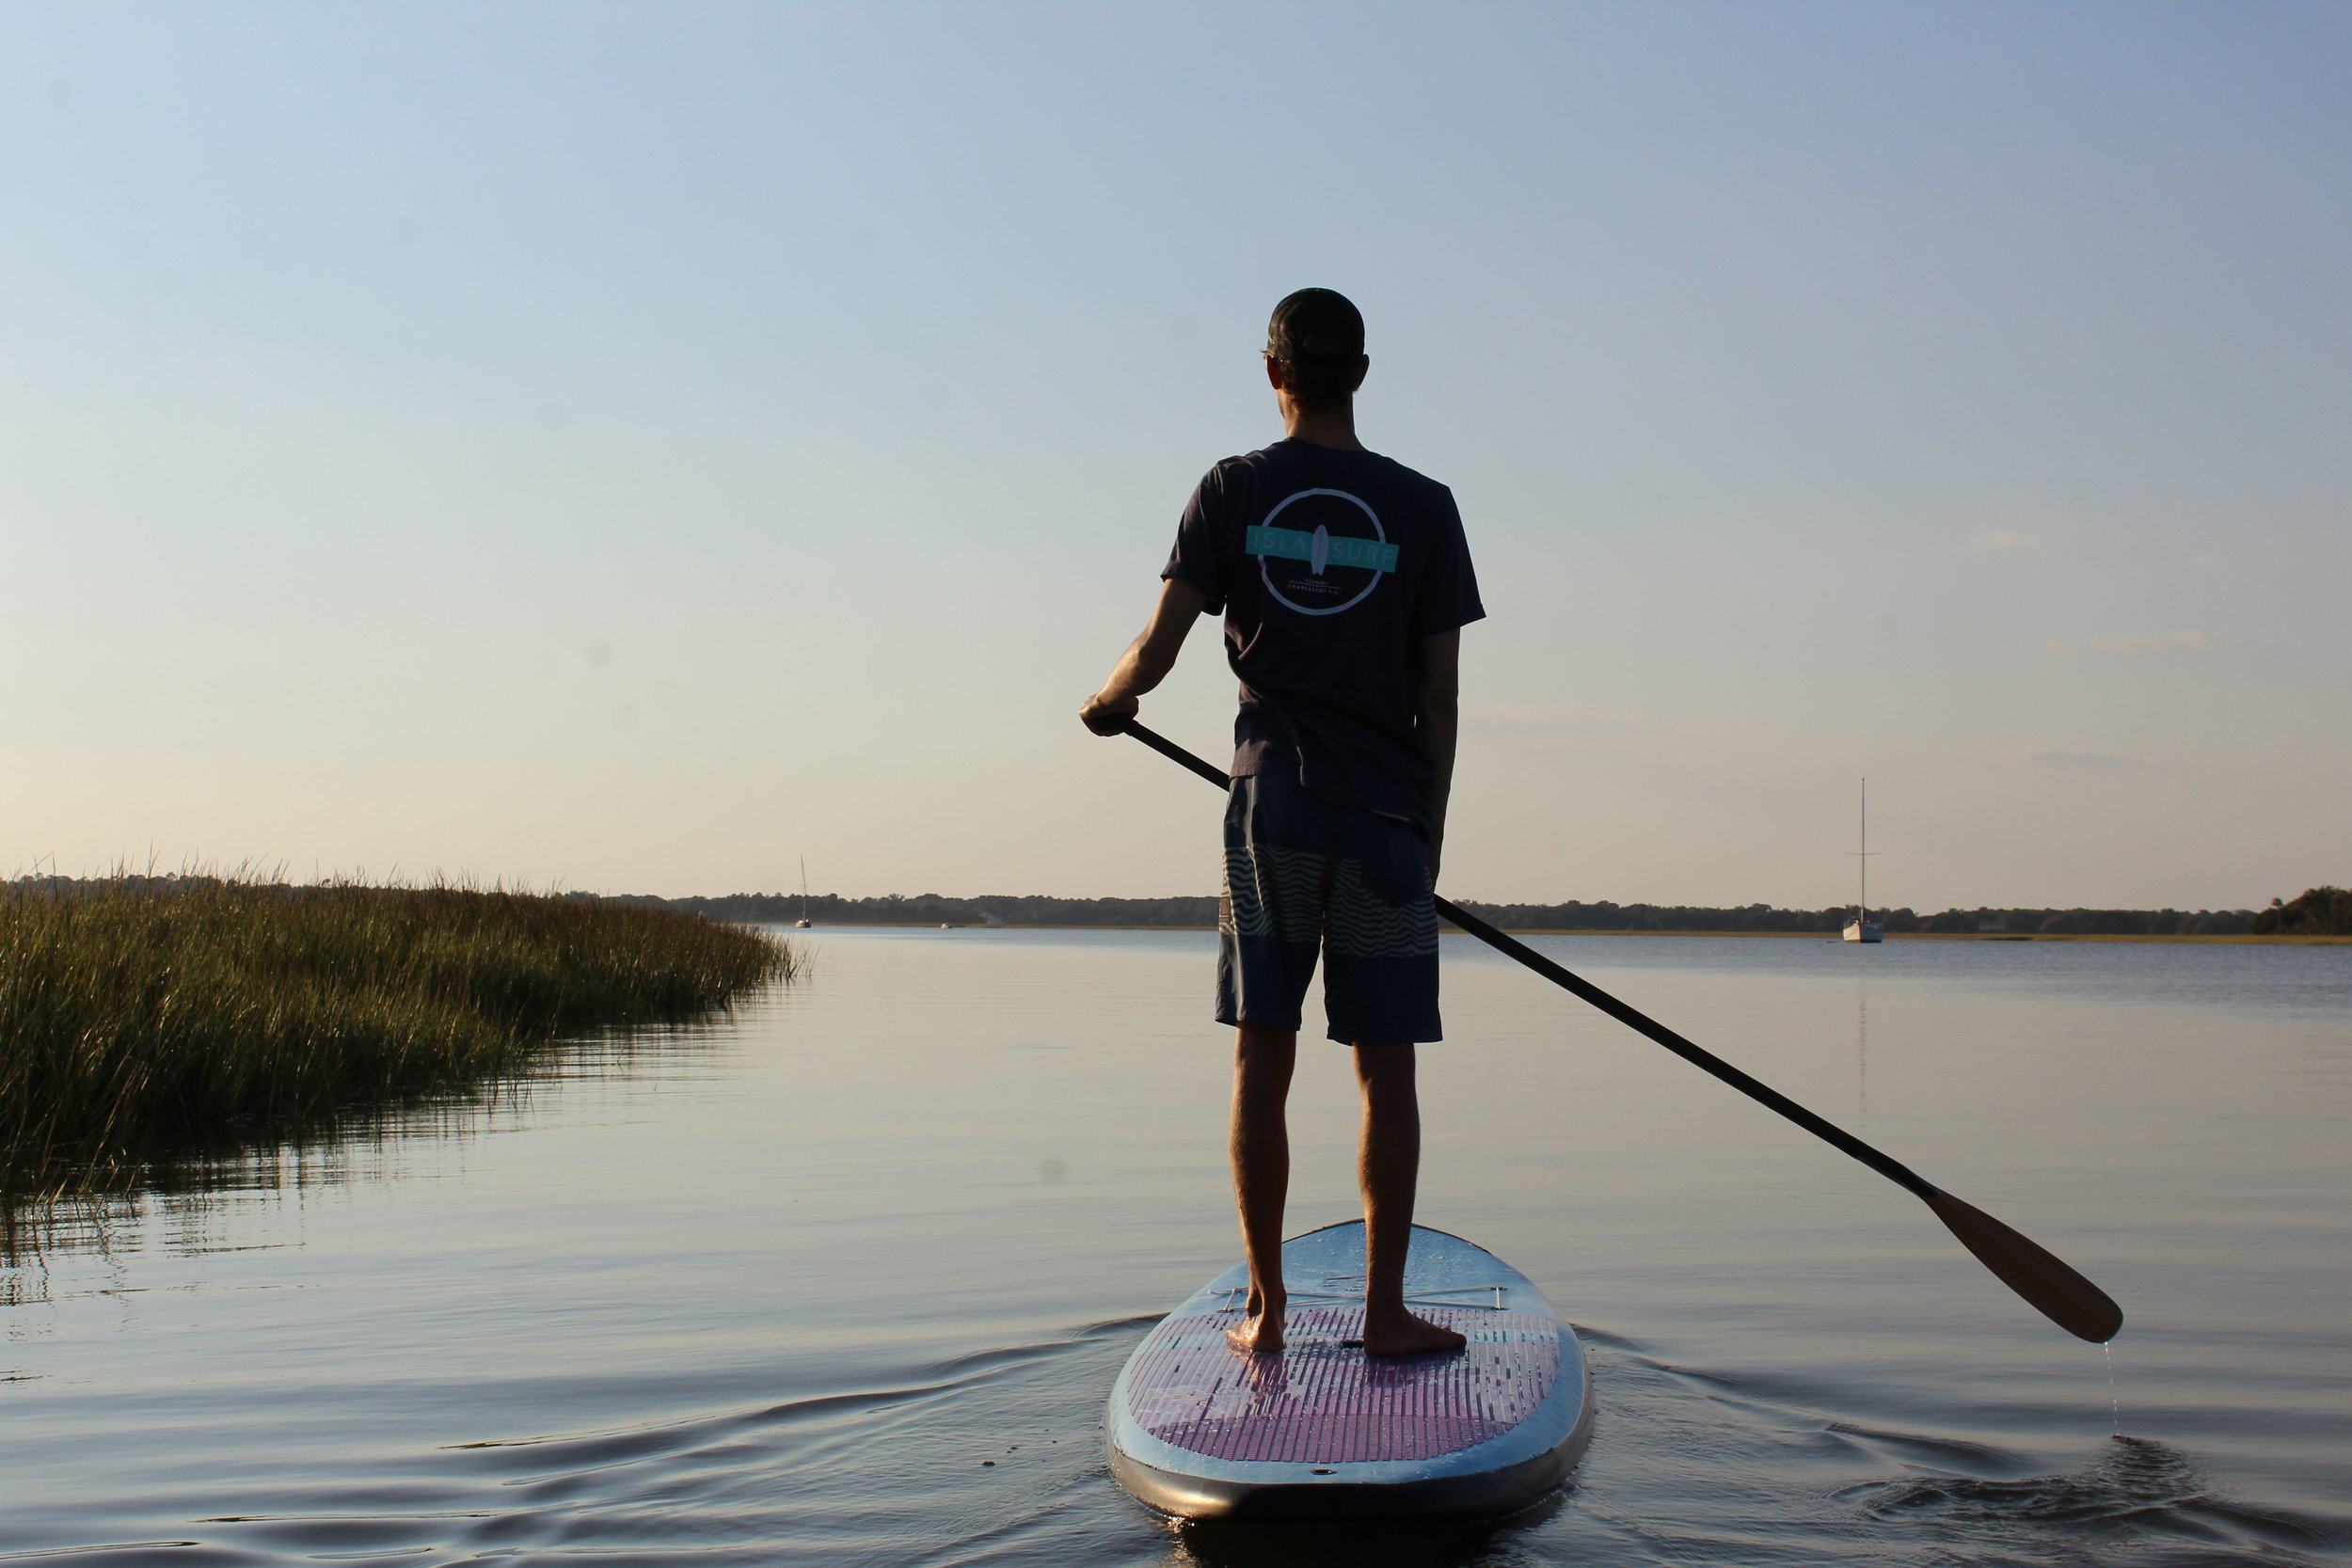 charleston-paddle-boarding-tours-isla.jpg